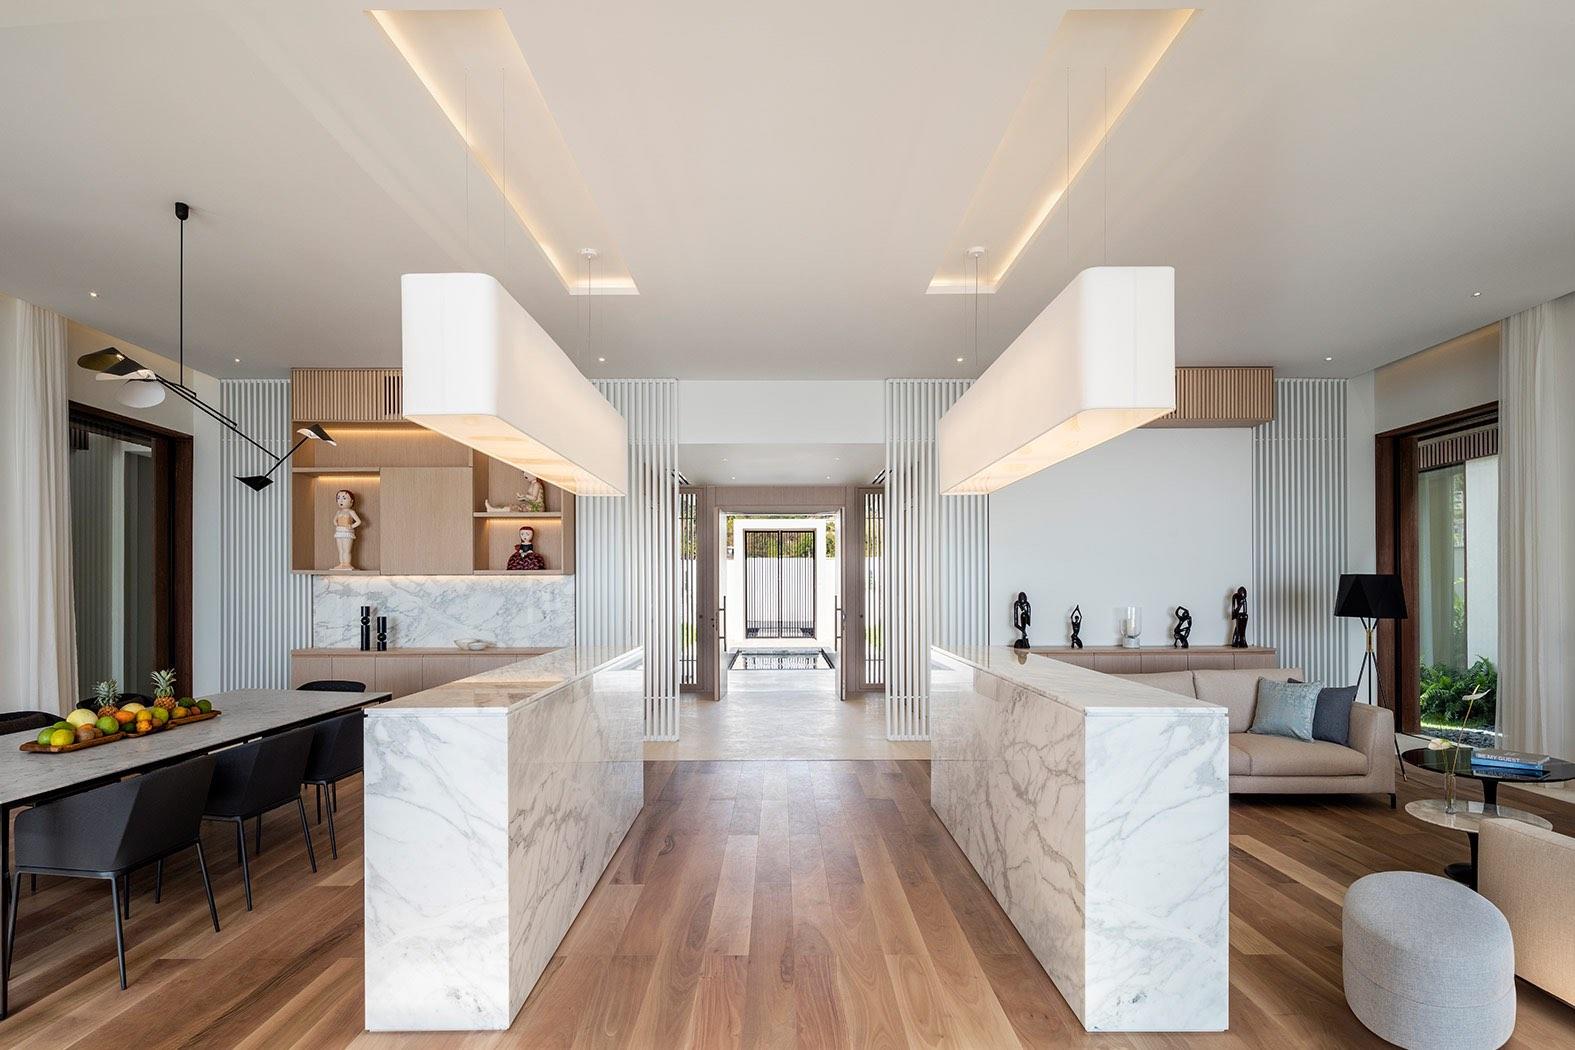 Silversands-Real-Estate-Beachfront-Villas-Gallery-2-5bfc69ecd7722.jpg